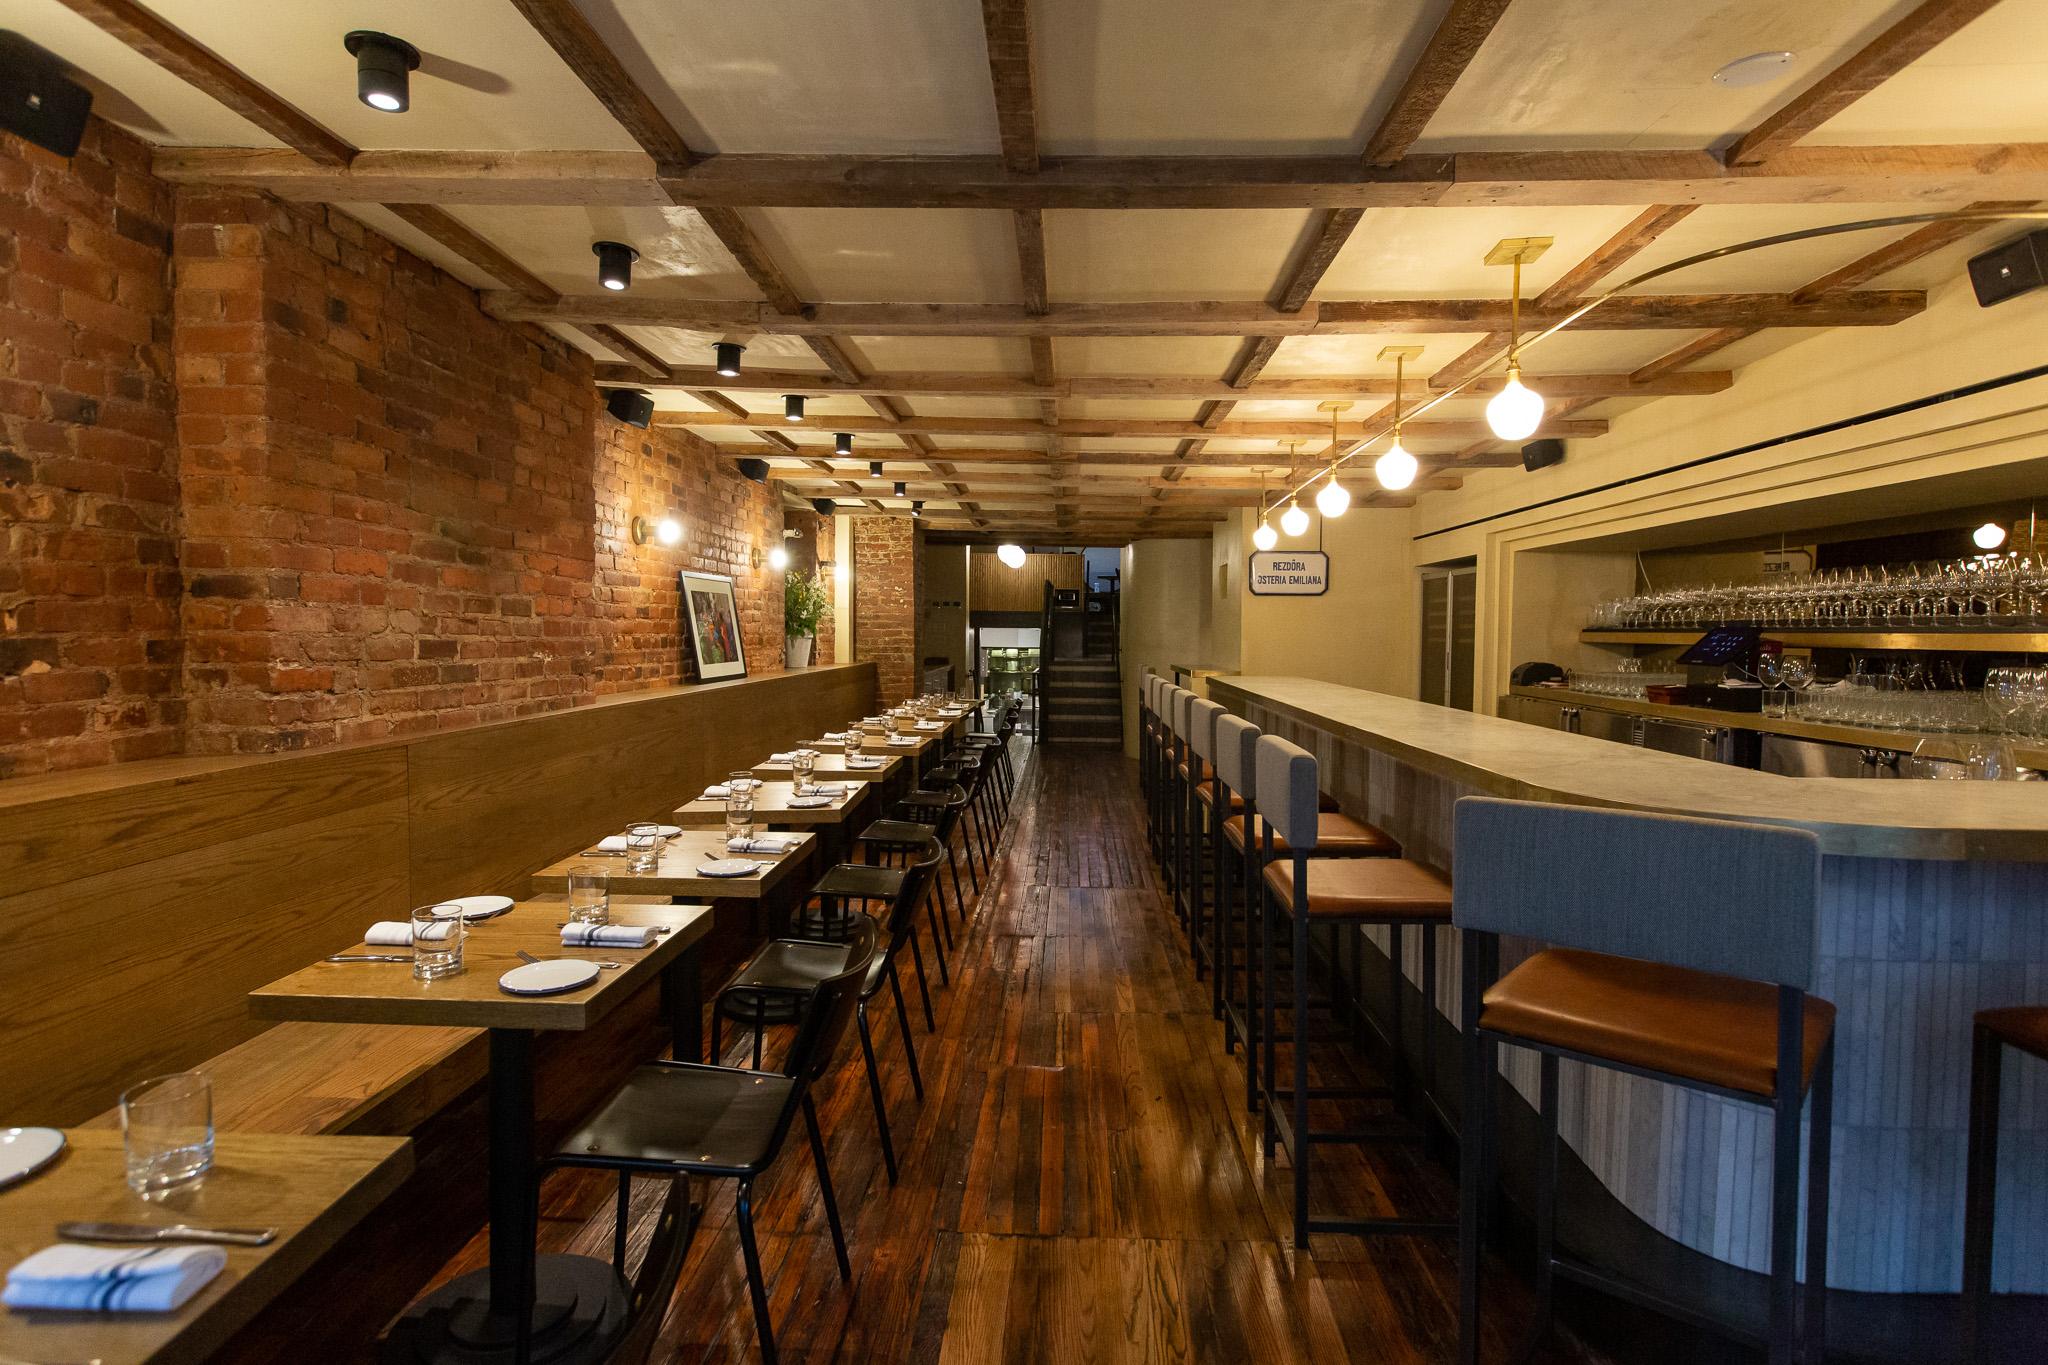 An Osteria Francescana Alum Opens His Own Casual Pasta Restaurant in Flatiron Tonight